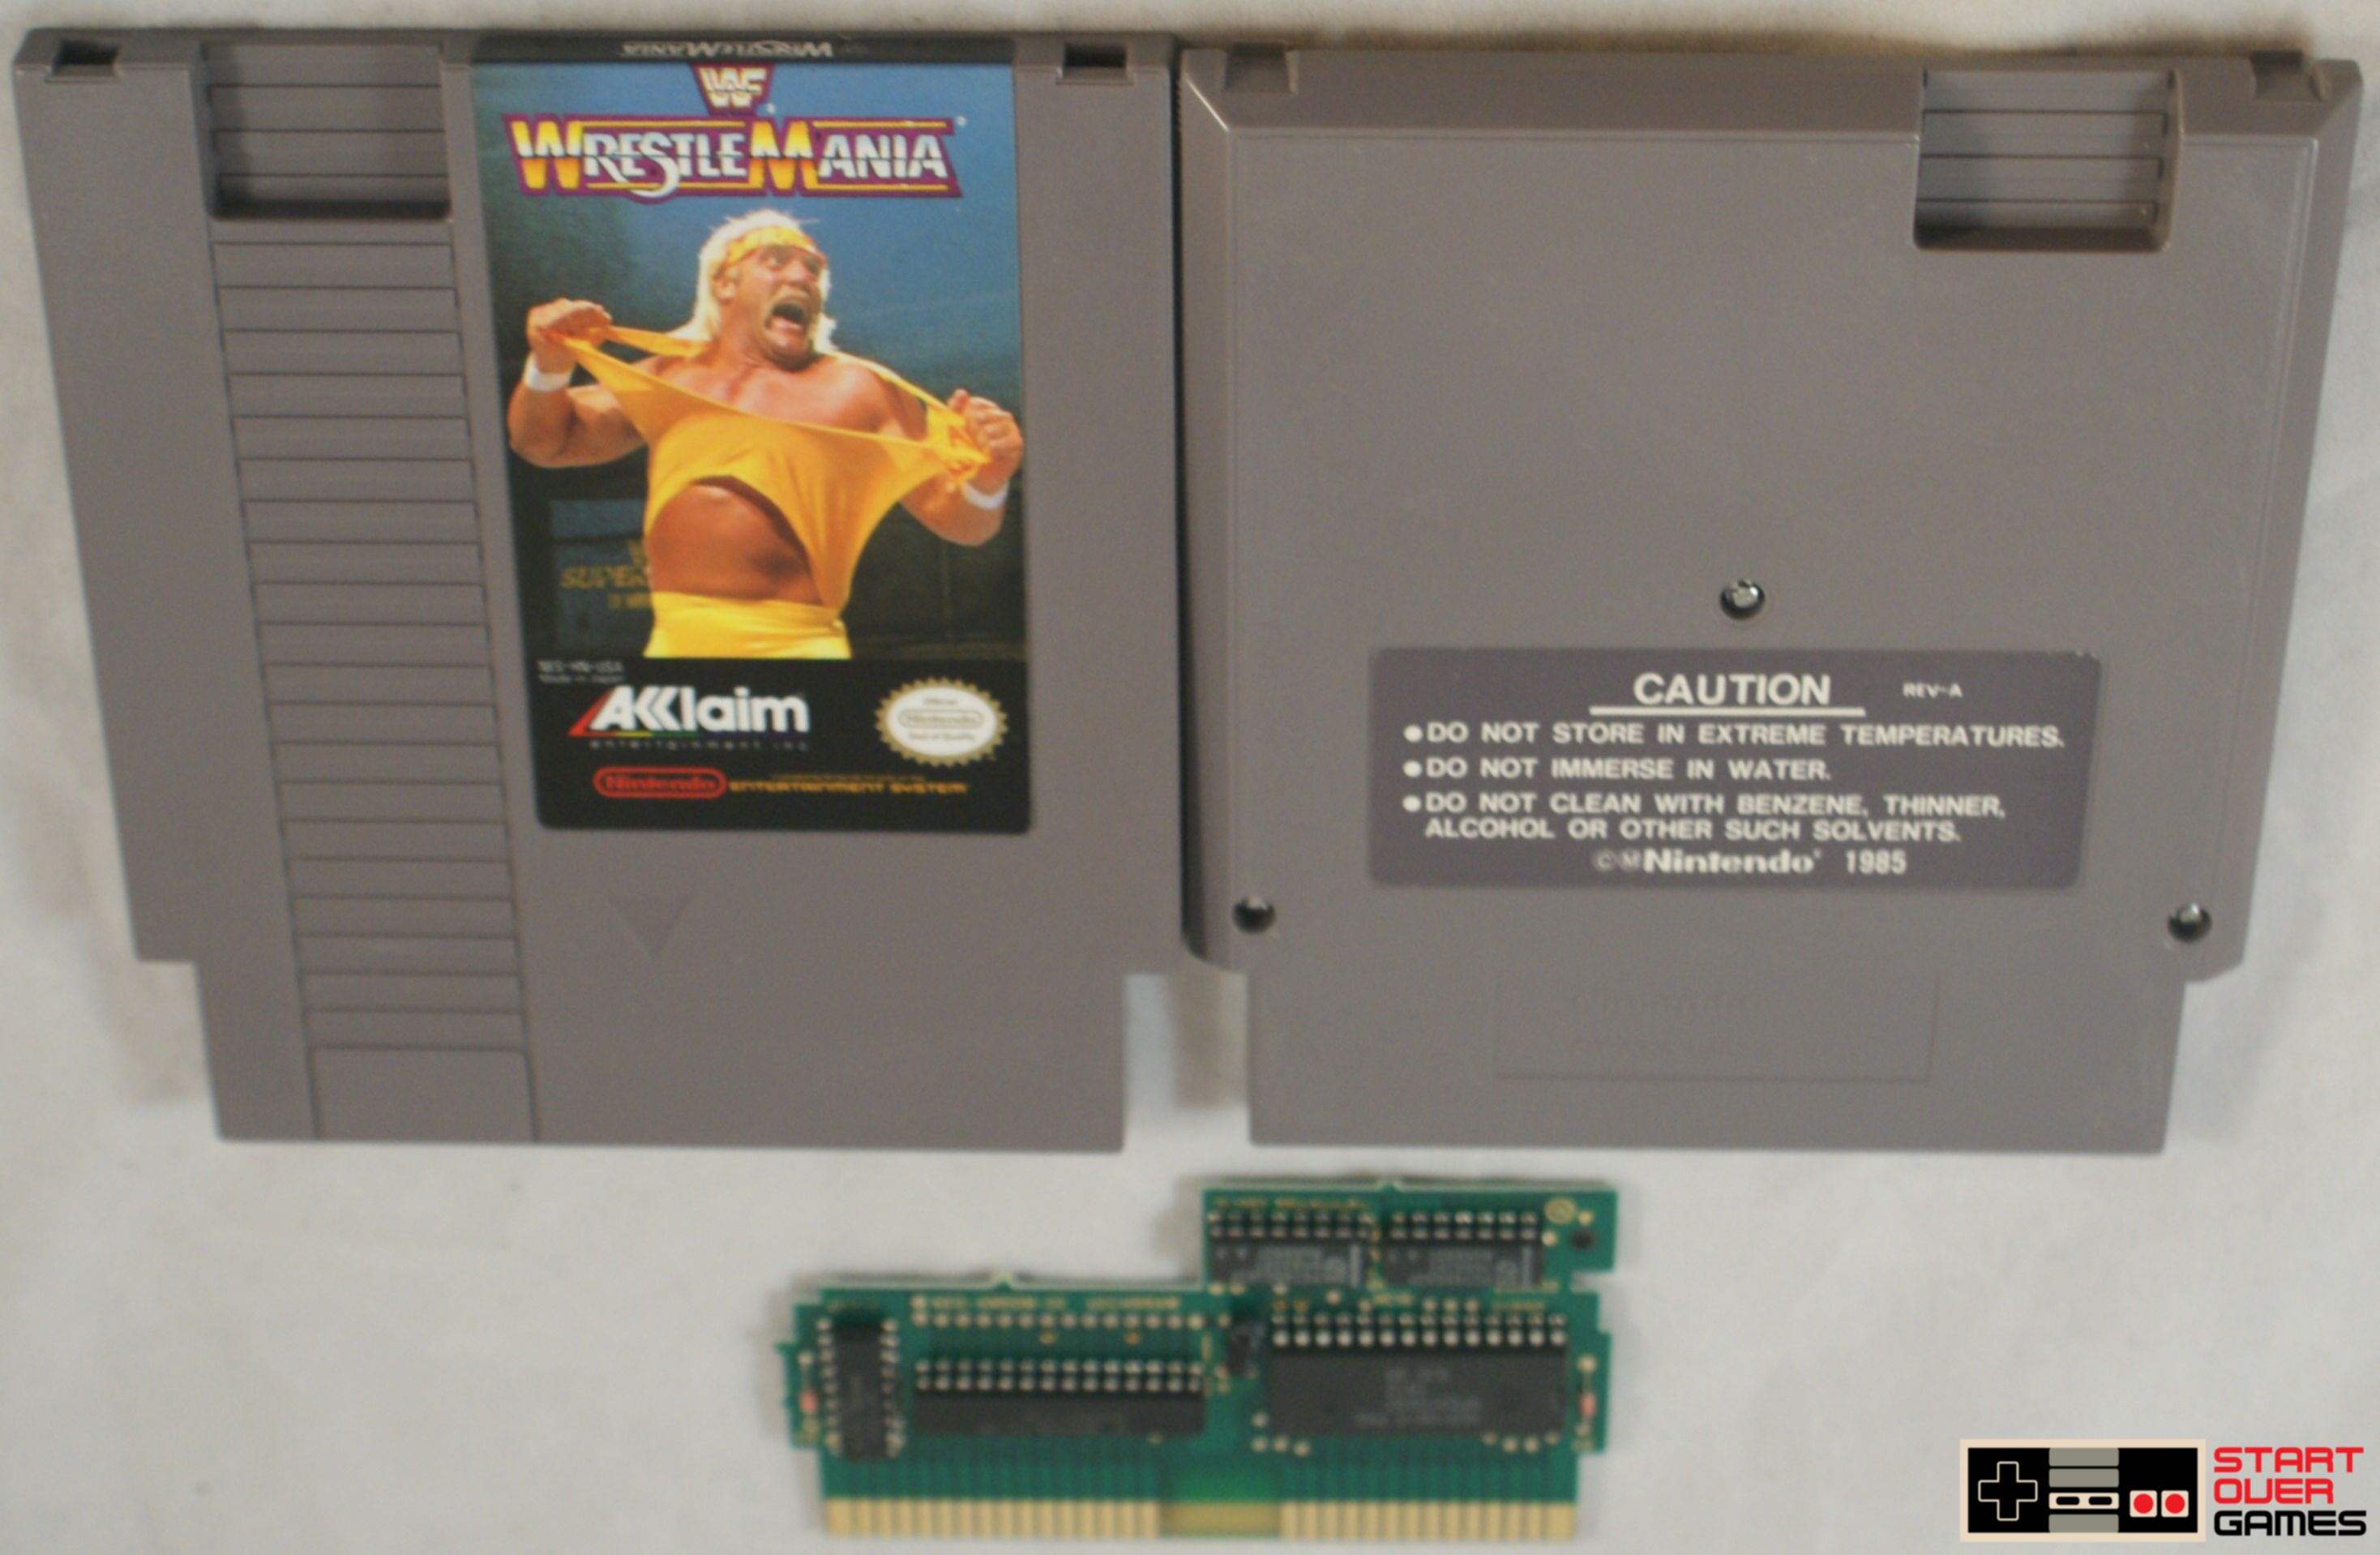 WWF Wrestlemania for the Nintendo Entertainment System